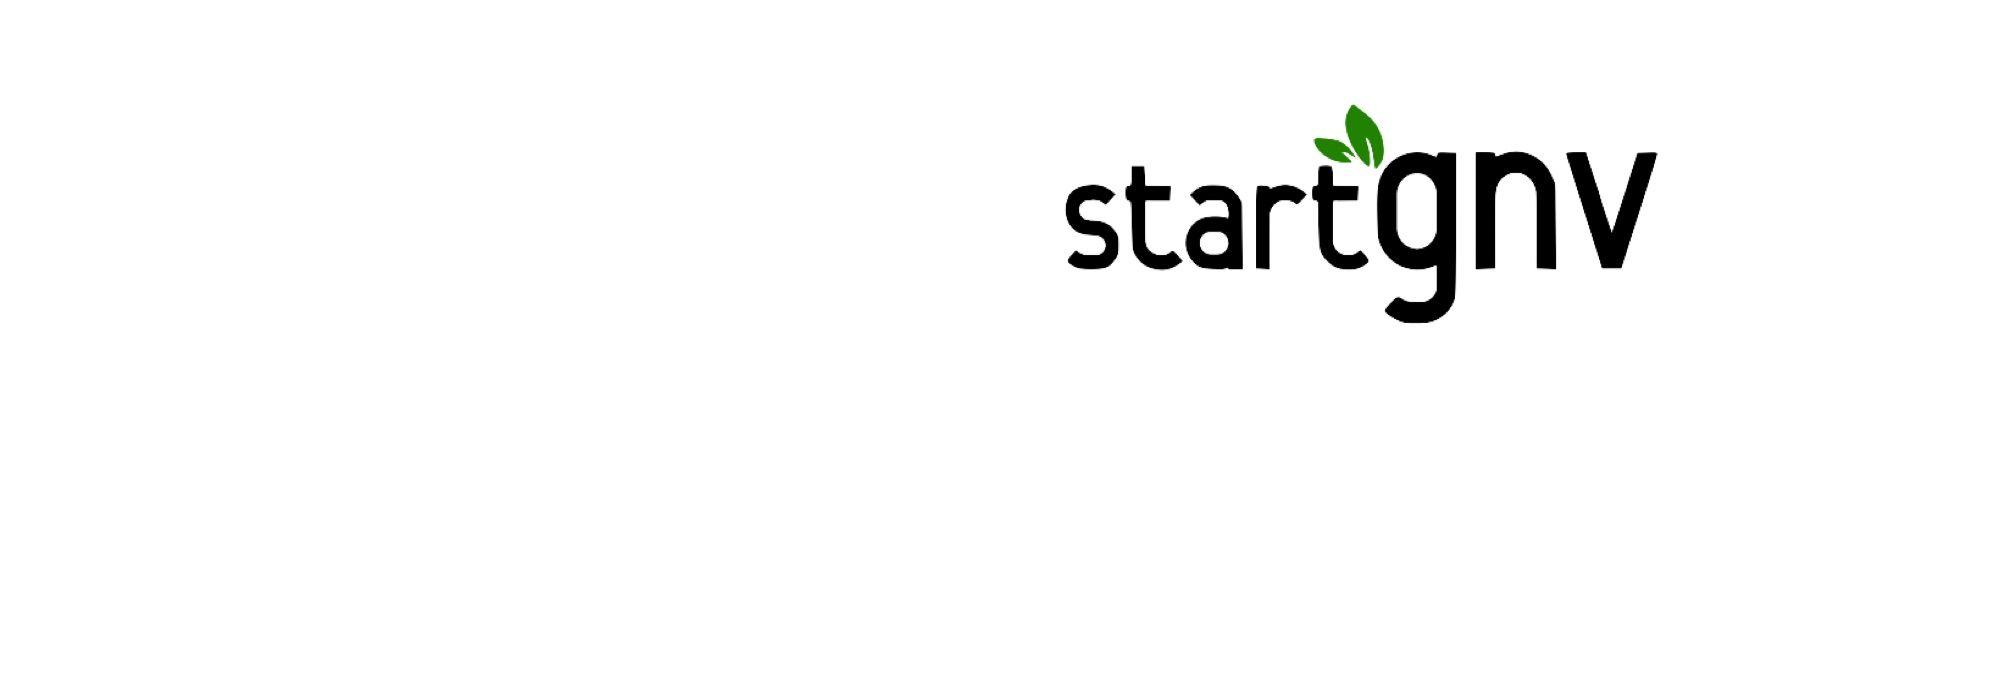 startupGNV --> startGNV